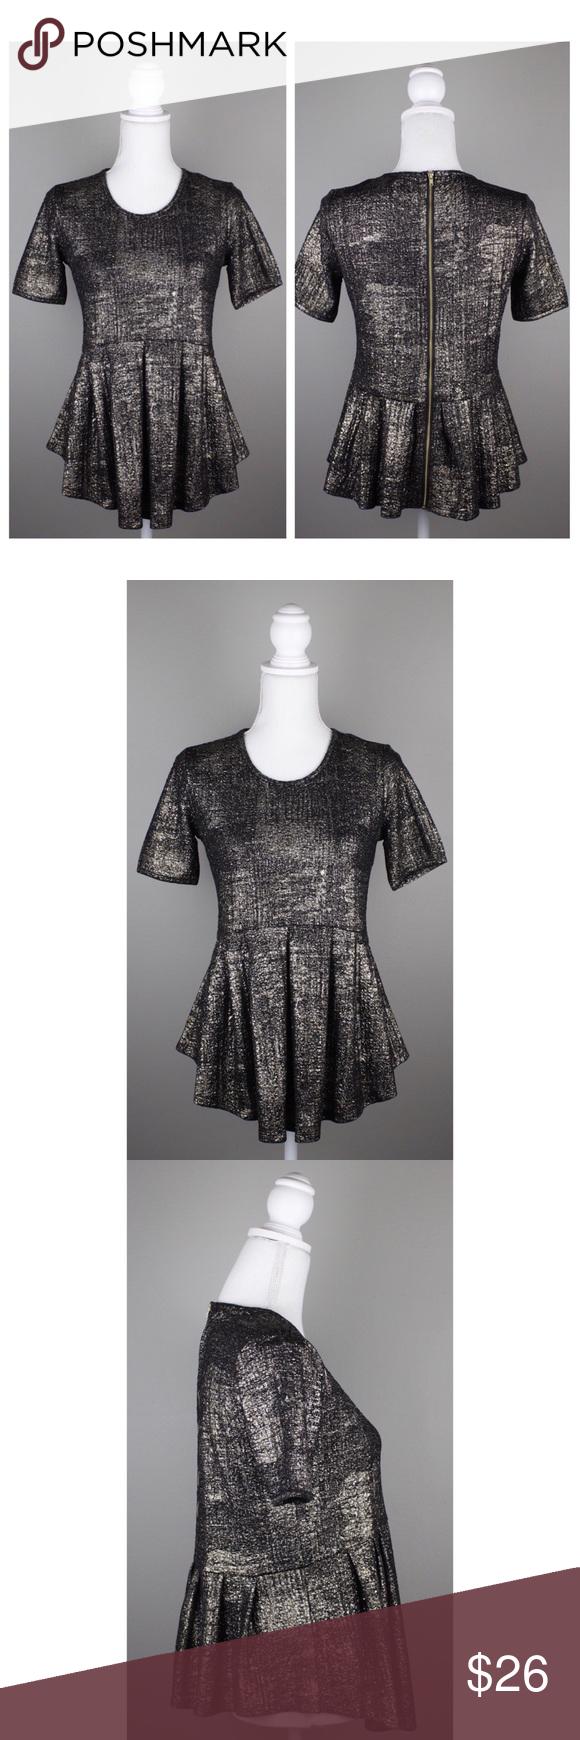 Eclair metallic short sleeve peplum dressy top my posh picks